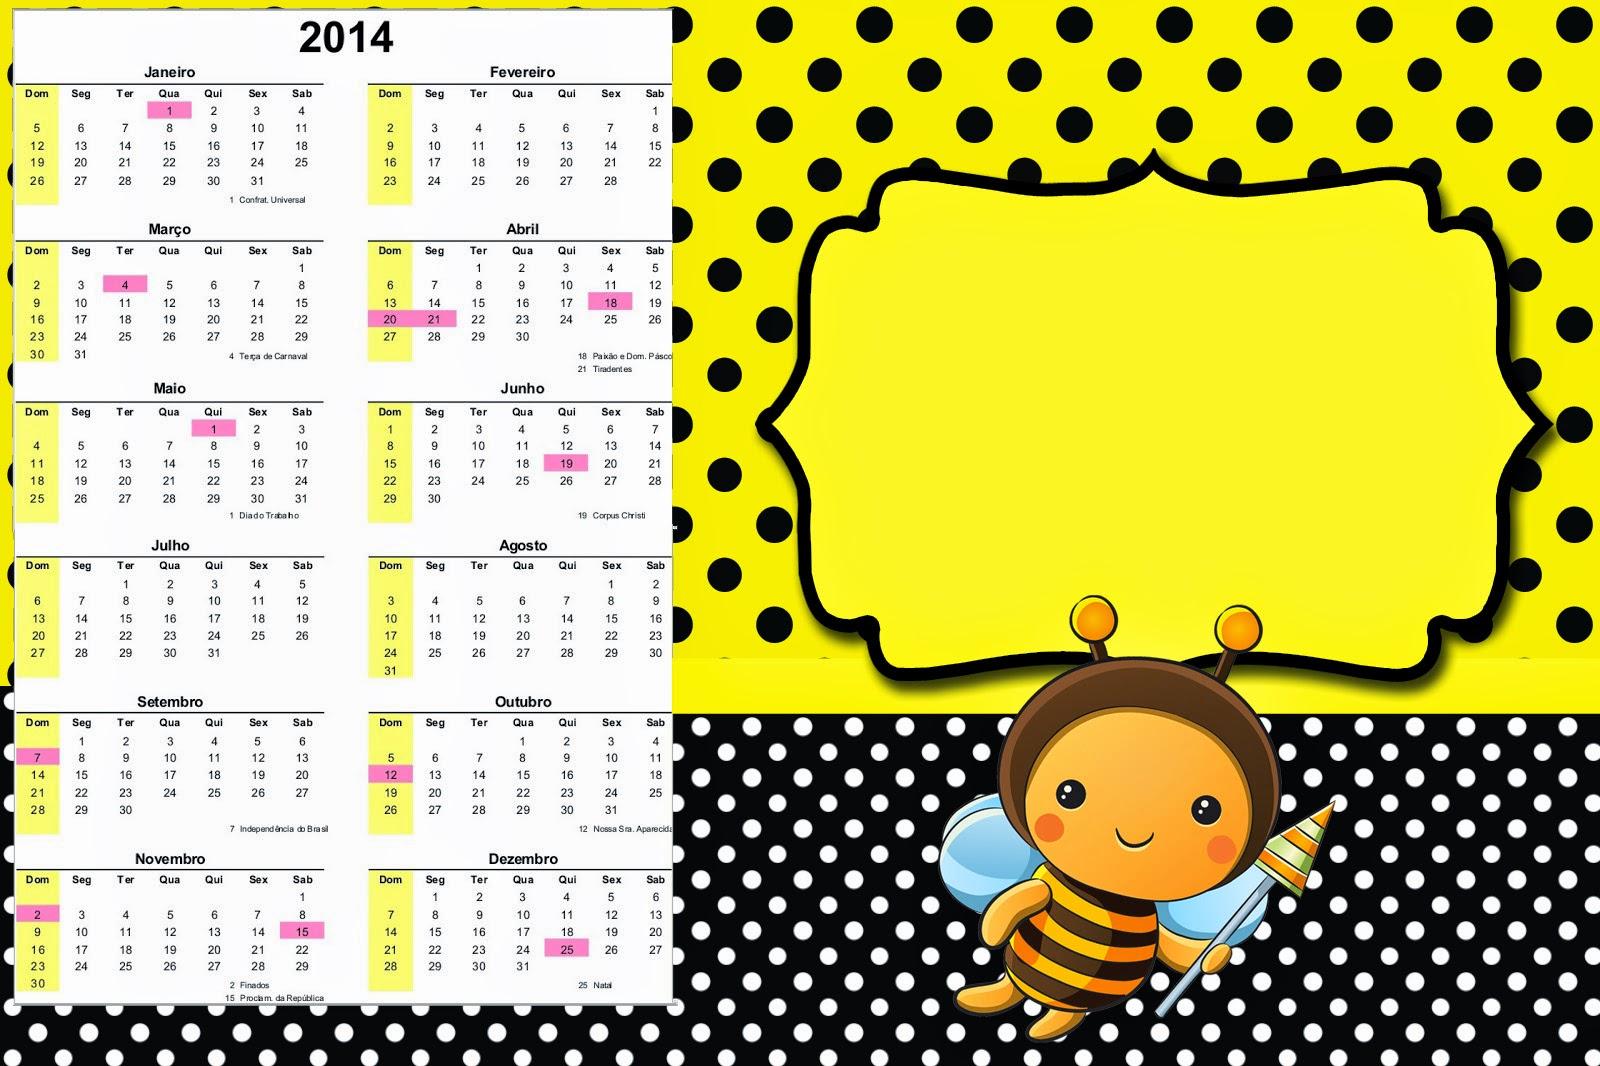 Calendario 2014 para imprimir gratis de  Abejitas Bebé.